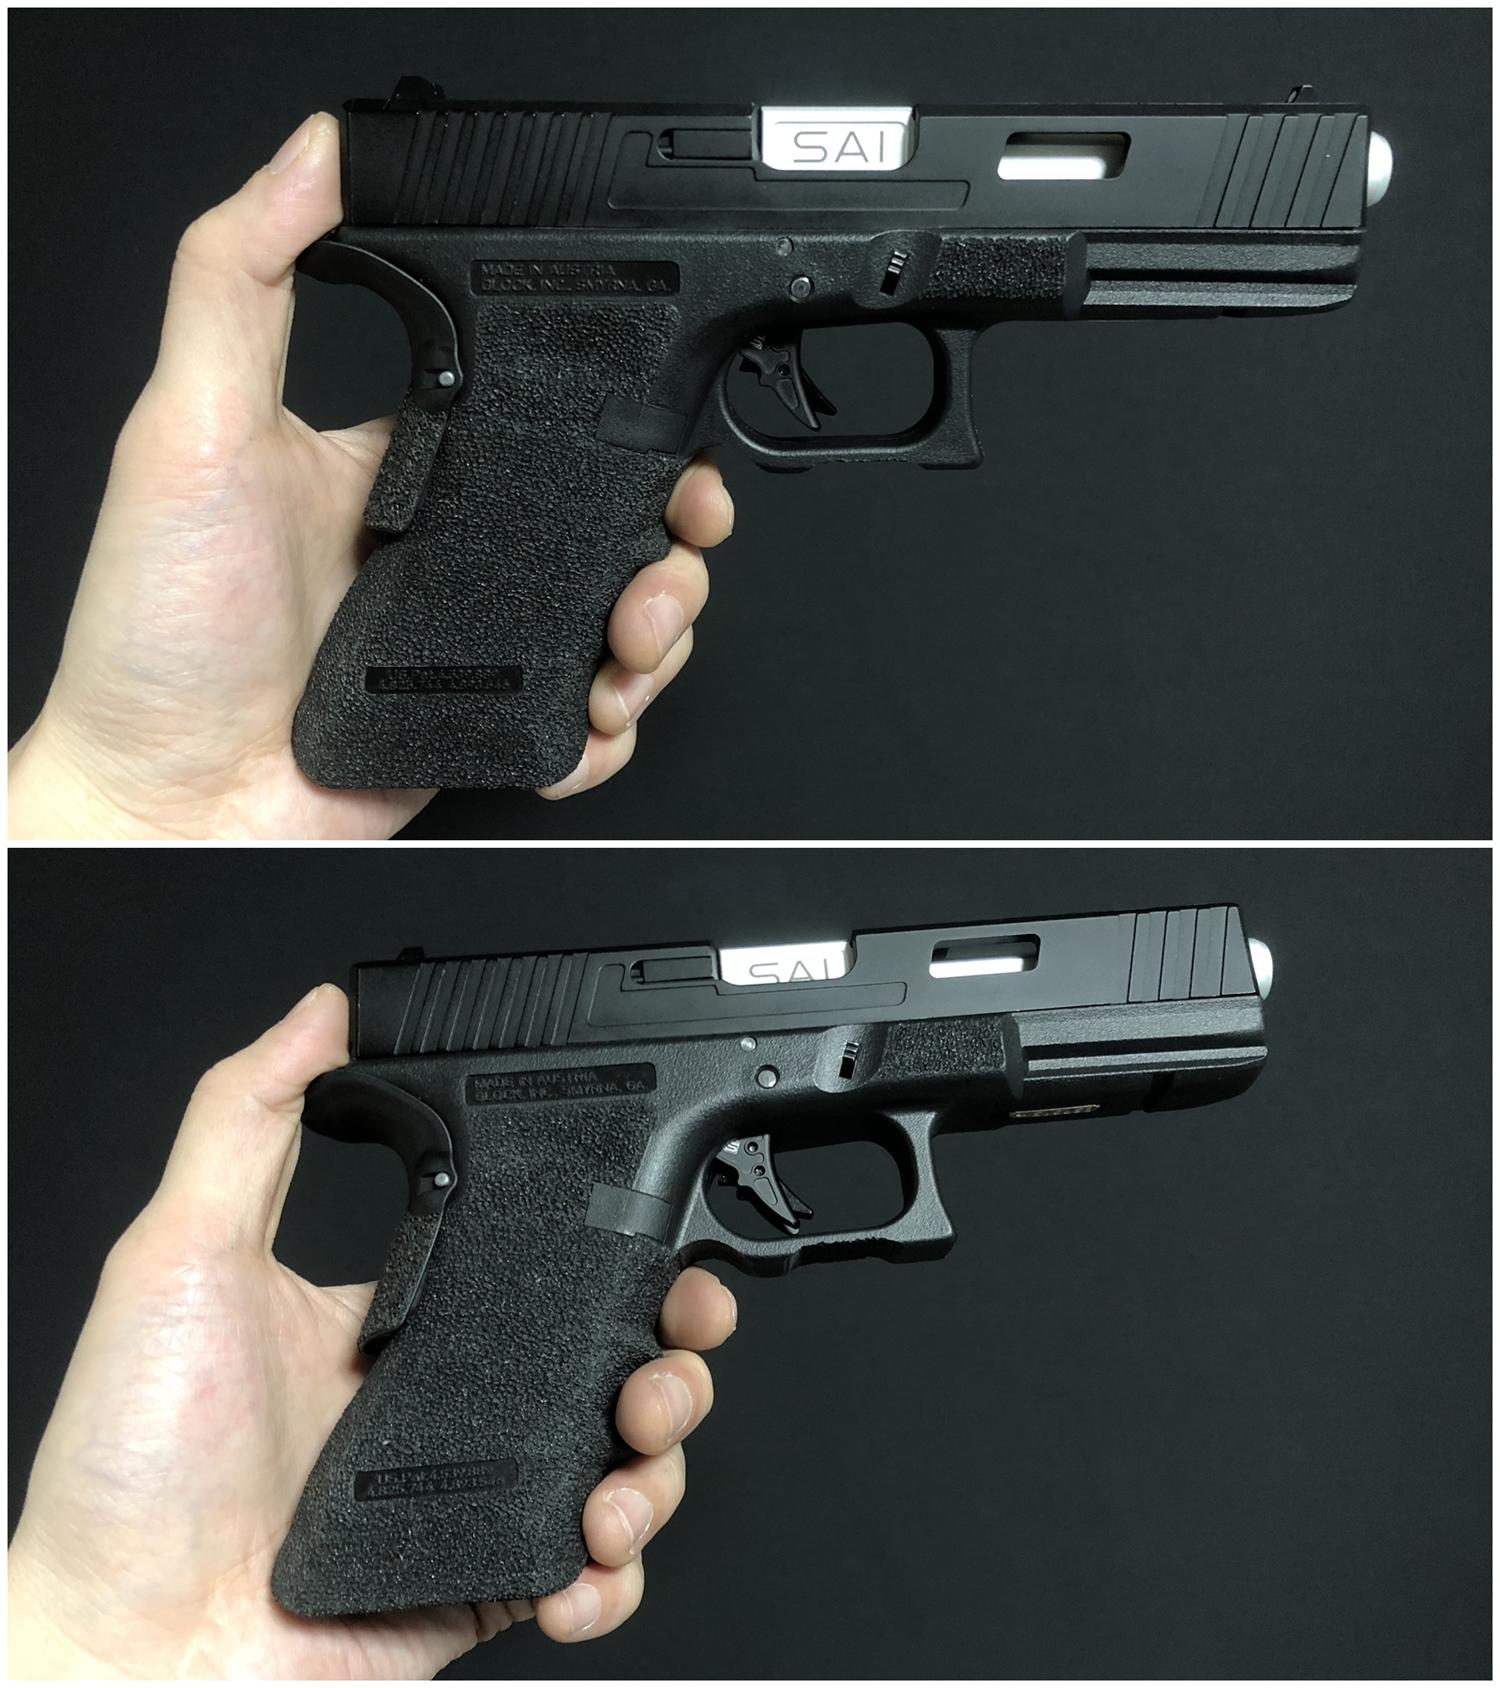 23 GunsModify GLOCK SAI アジャスタブルトリガー Ver3 GM0026 GM0079 に交換してみた! GLOCK G18C カスタム 購入 分解 取付 交換 取付方法 レビュー!!